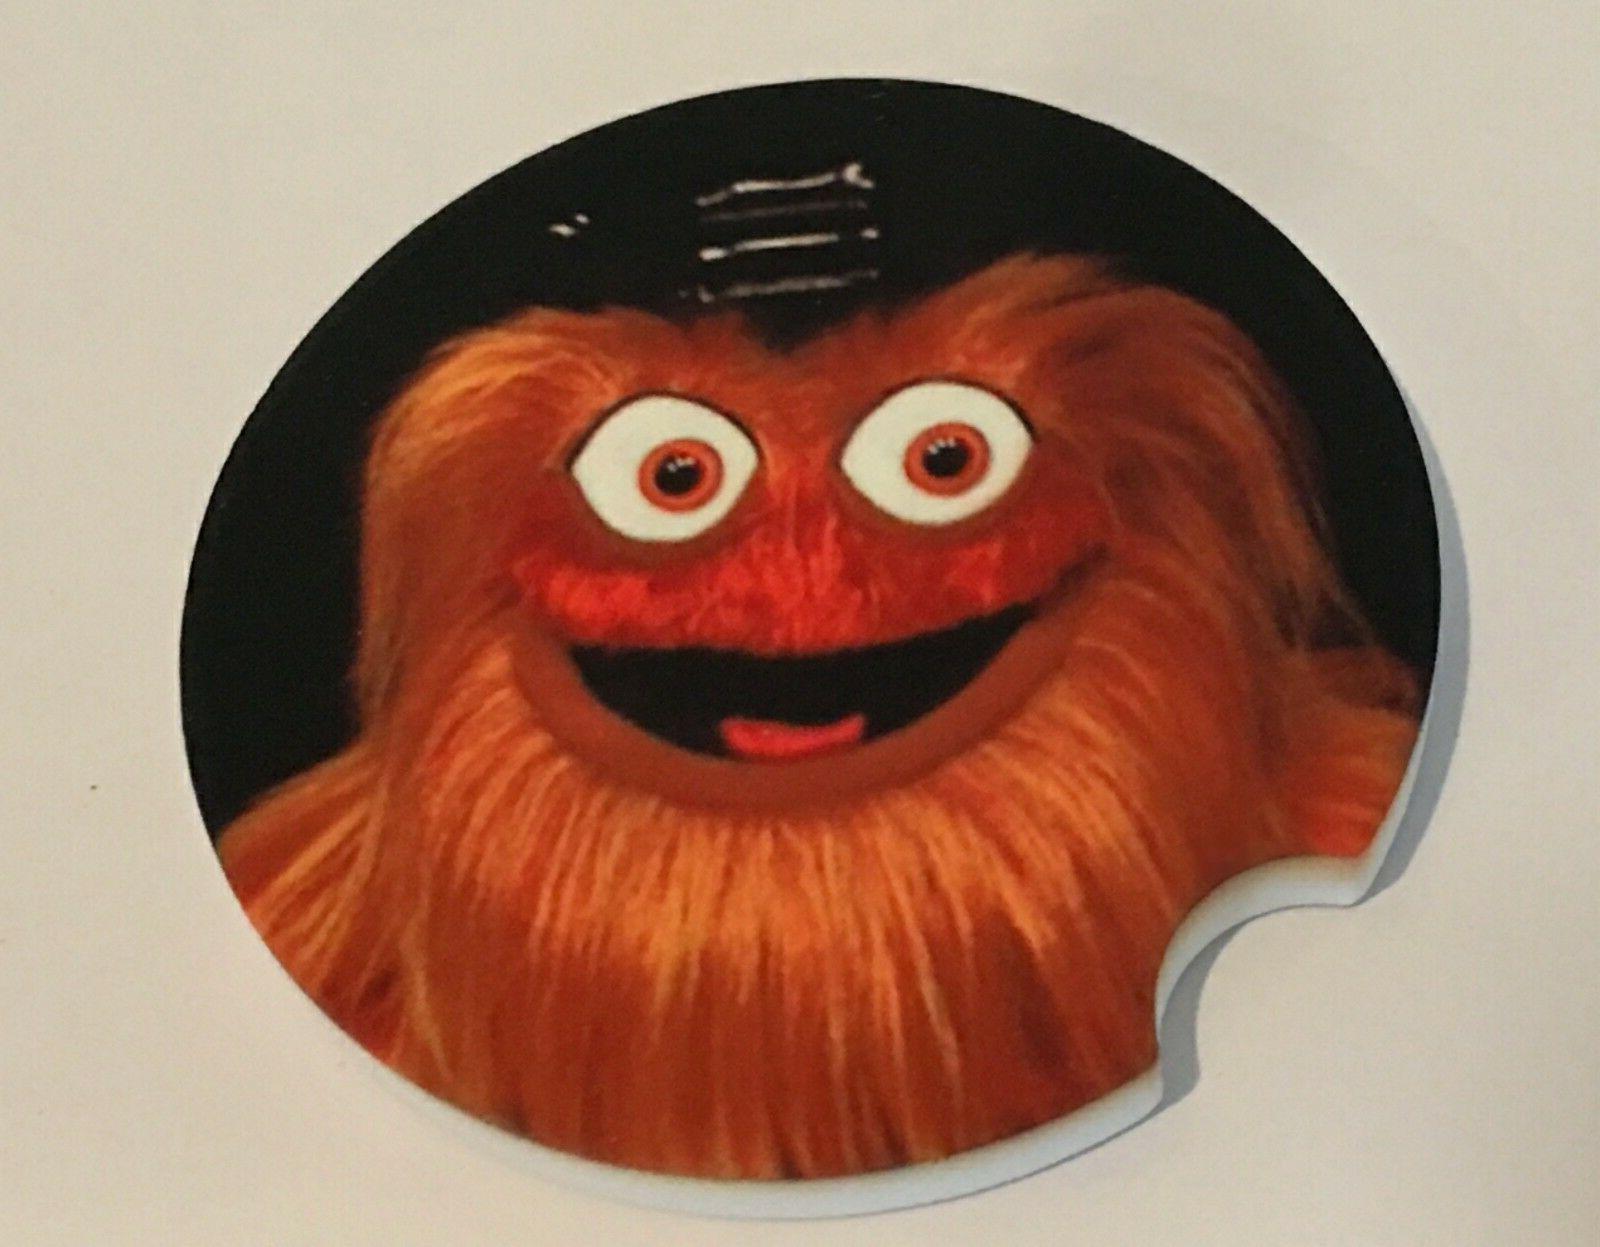 PAIR PHILADELPHIA FLYERS mascot GRITTY Car Coaster Sandstone